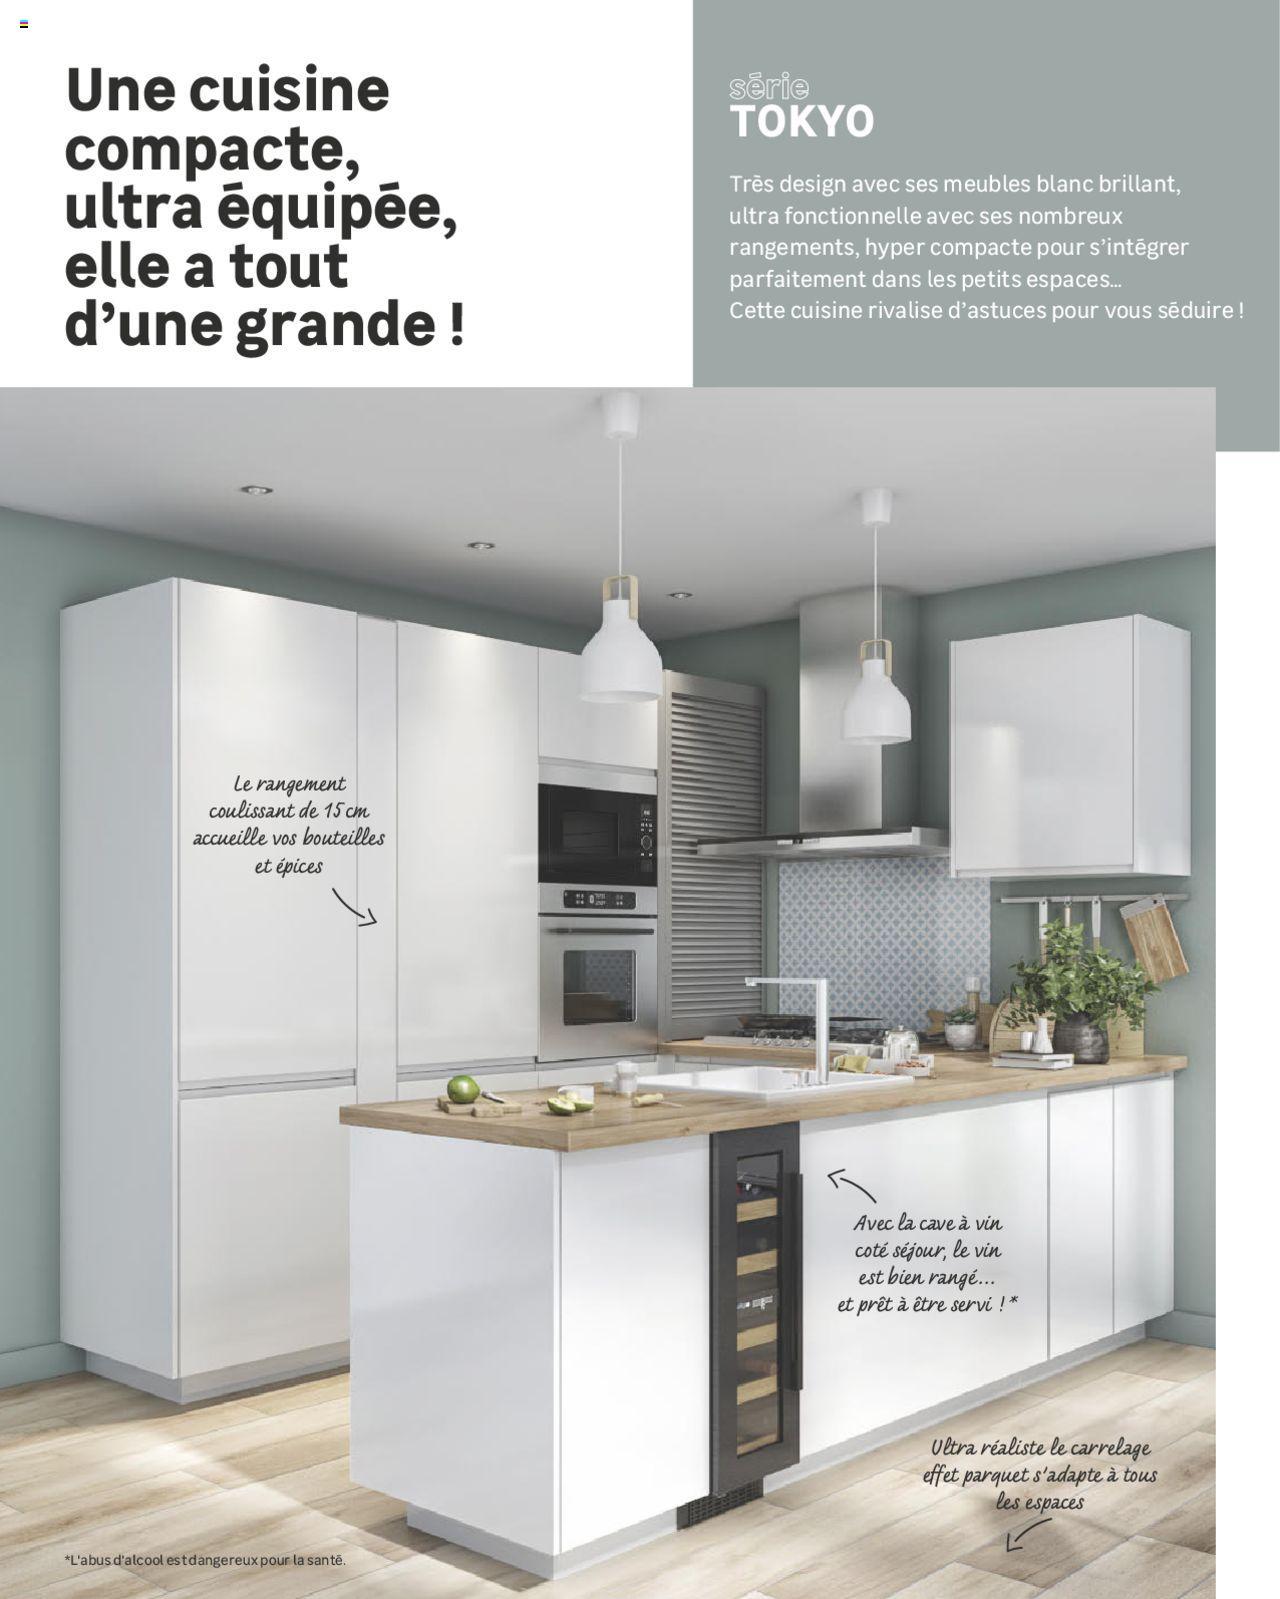 Leroy Merlin Prospectus Cuisine À Partir Du 01/05/2020 concernant Adaptateur Intex 32 38 Leroy Merlin